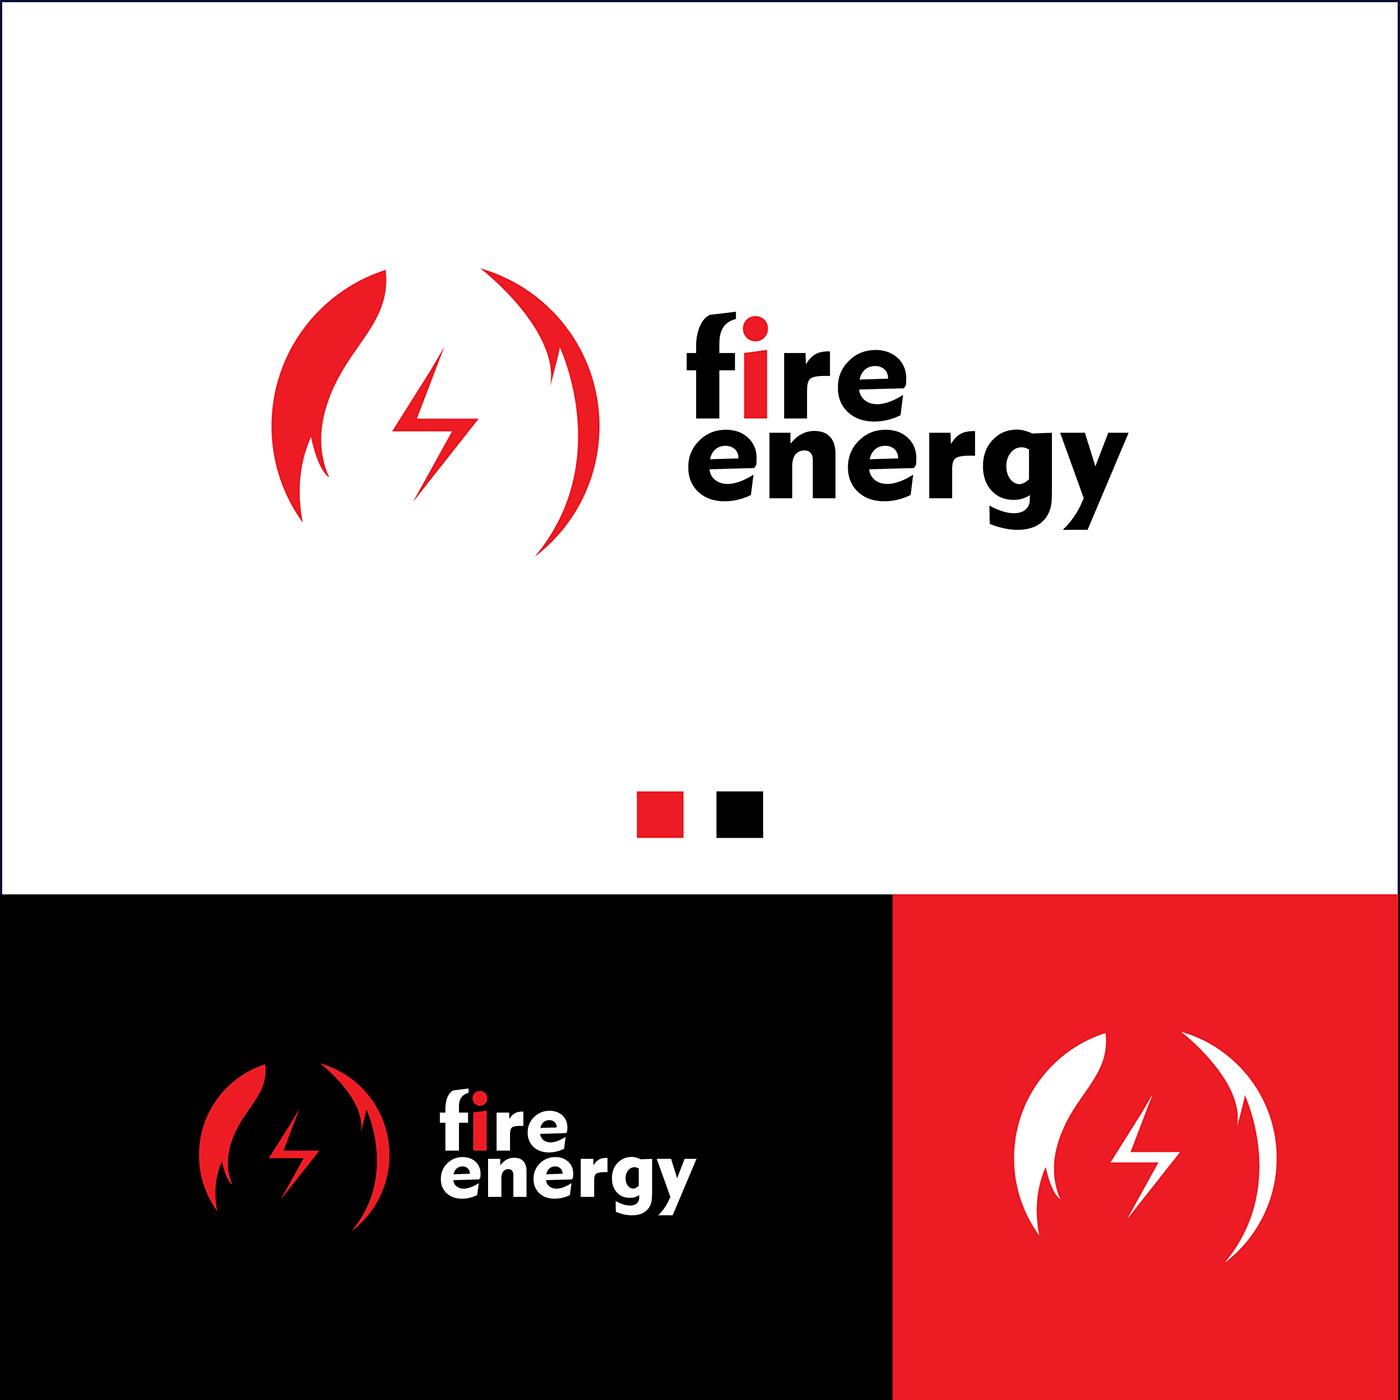 art design flatdesign GraphicDesogn logo logodaily logodesign logoroom monotype typhography